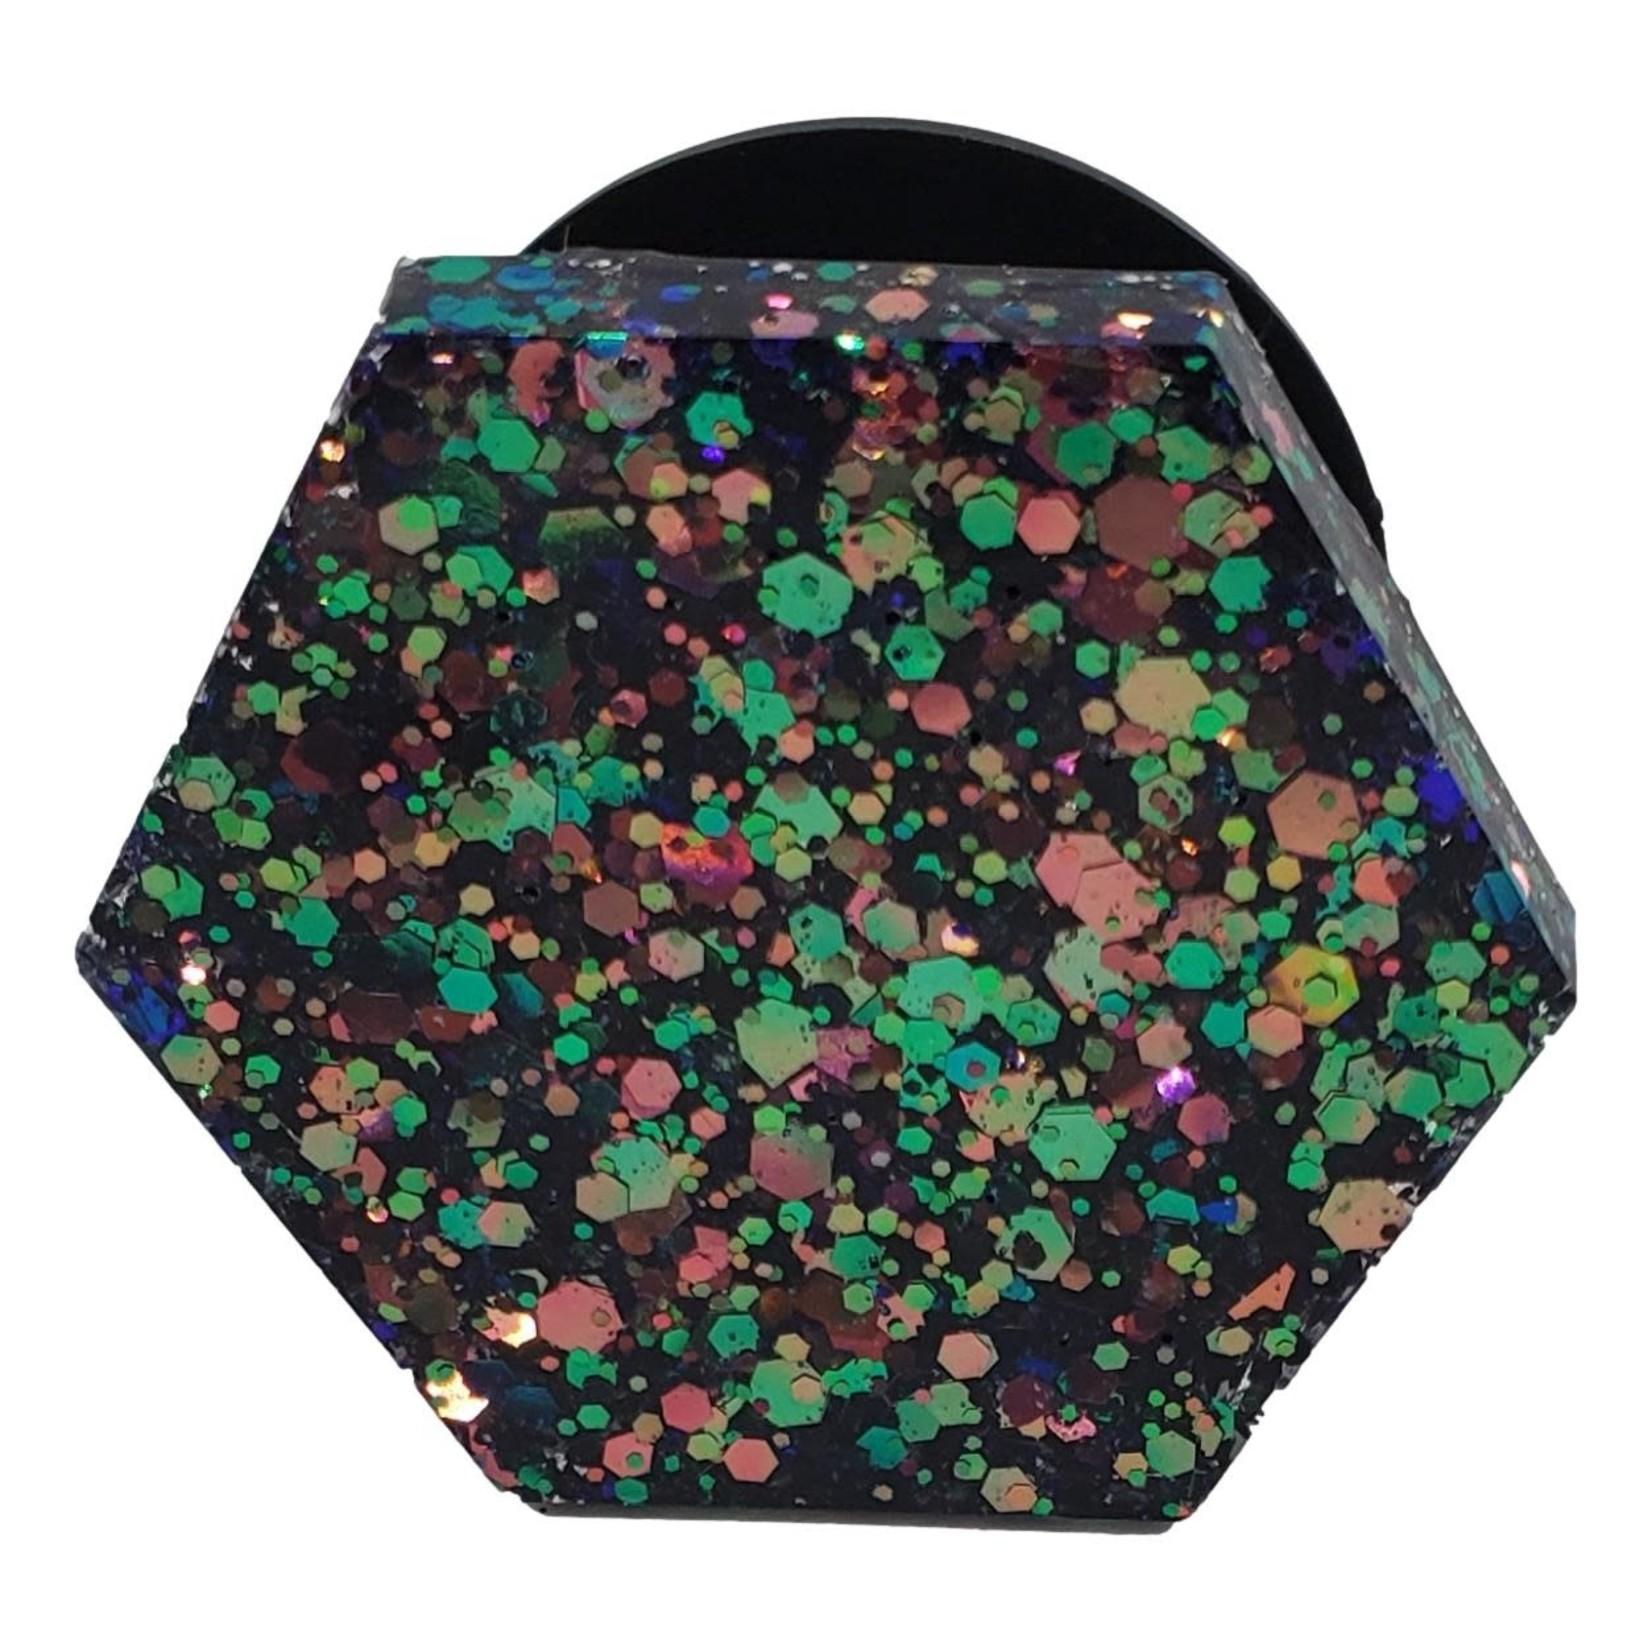 East Coast Sirens Colour-shifting Glitter Phone Pop-Up